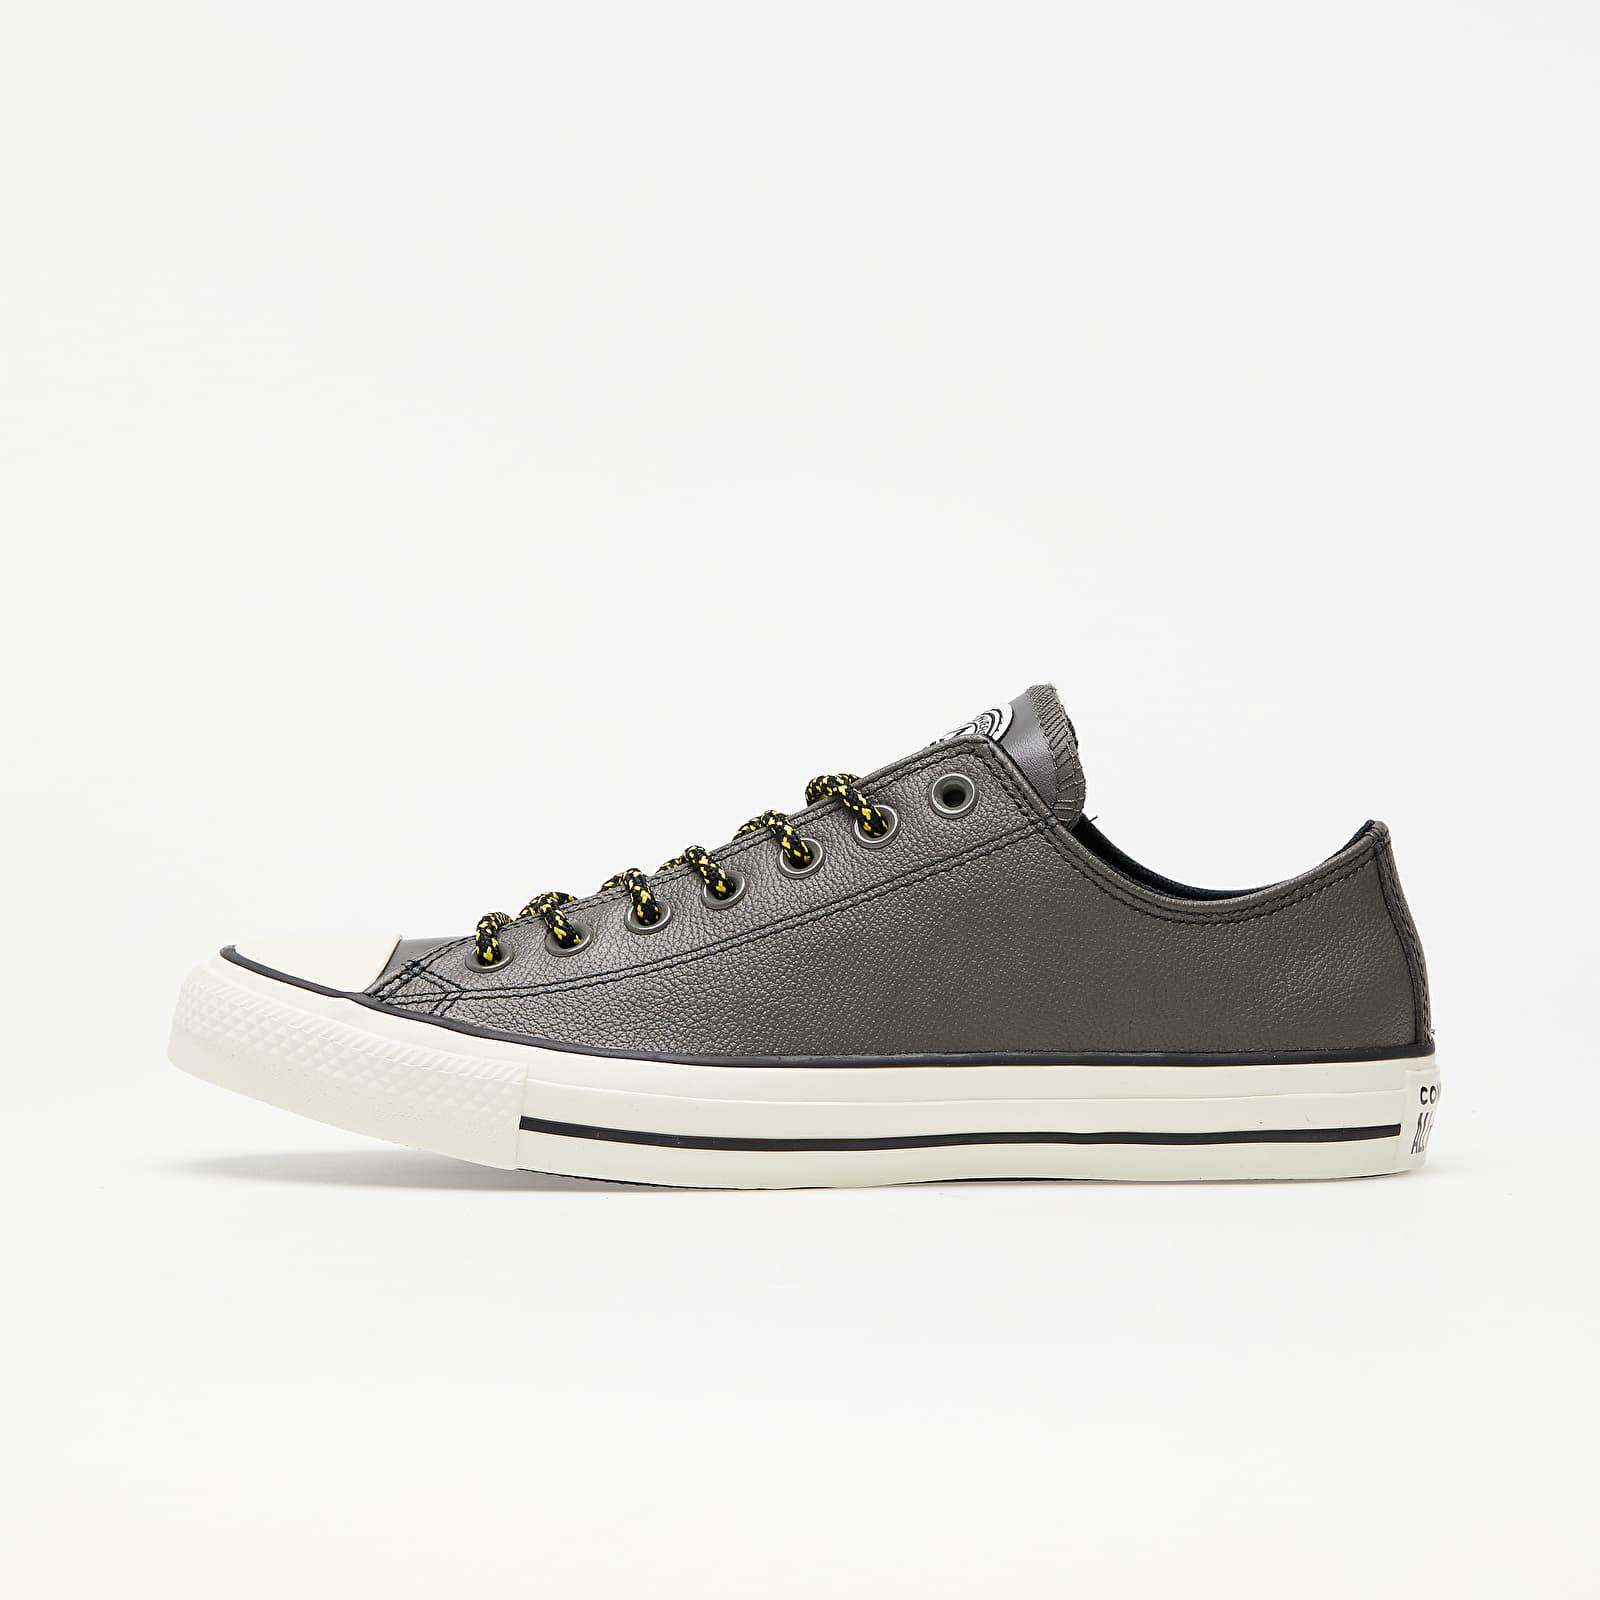 Converse Chuck Taylor All Star Archival Leather Carbon Grey/ Vivid Sulfur/ Egret 165961C